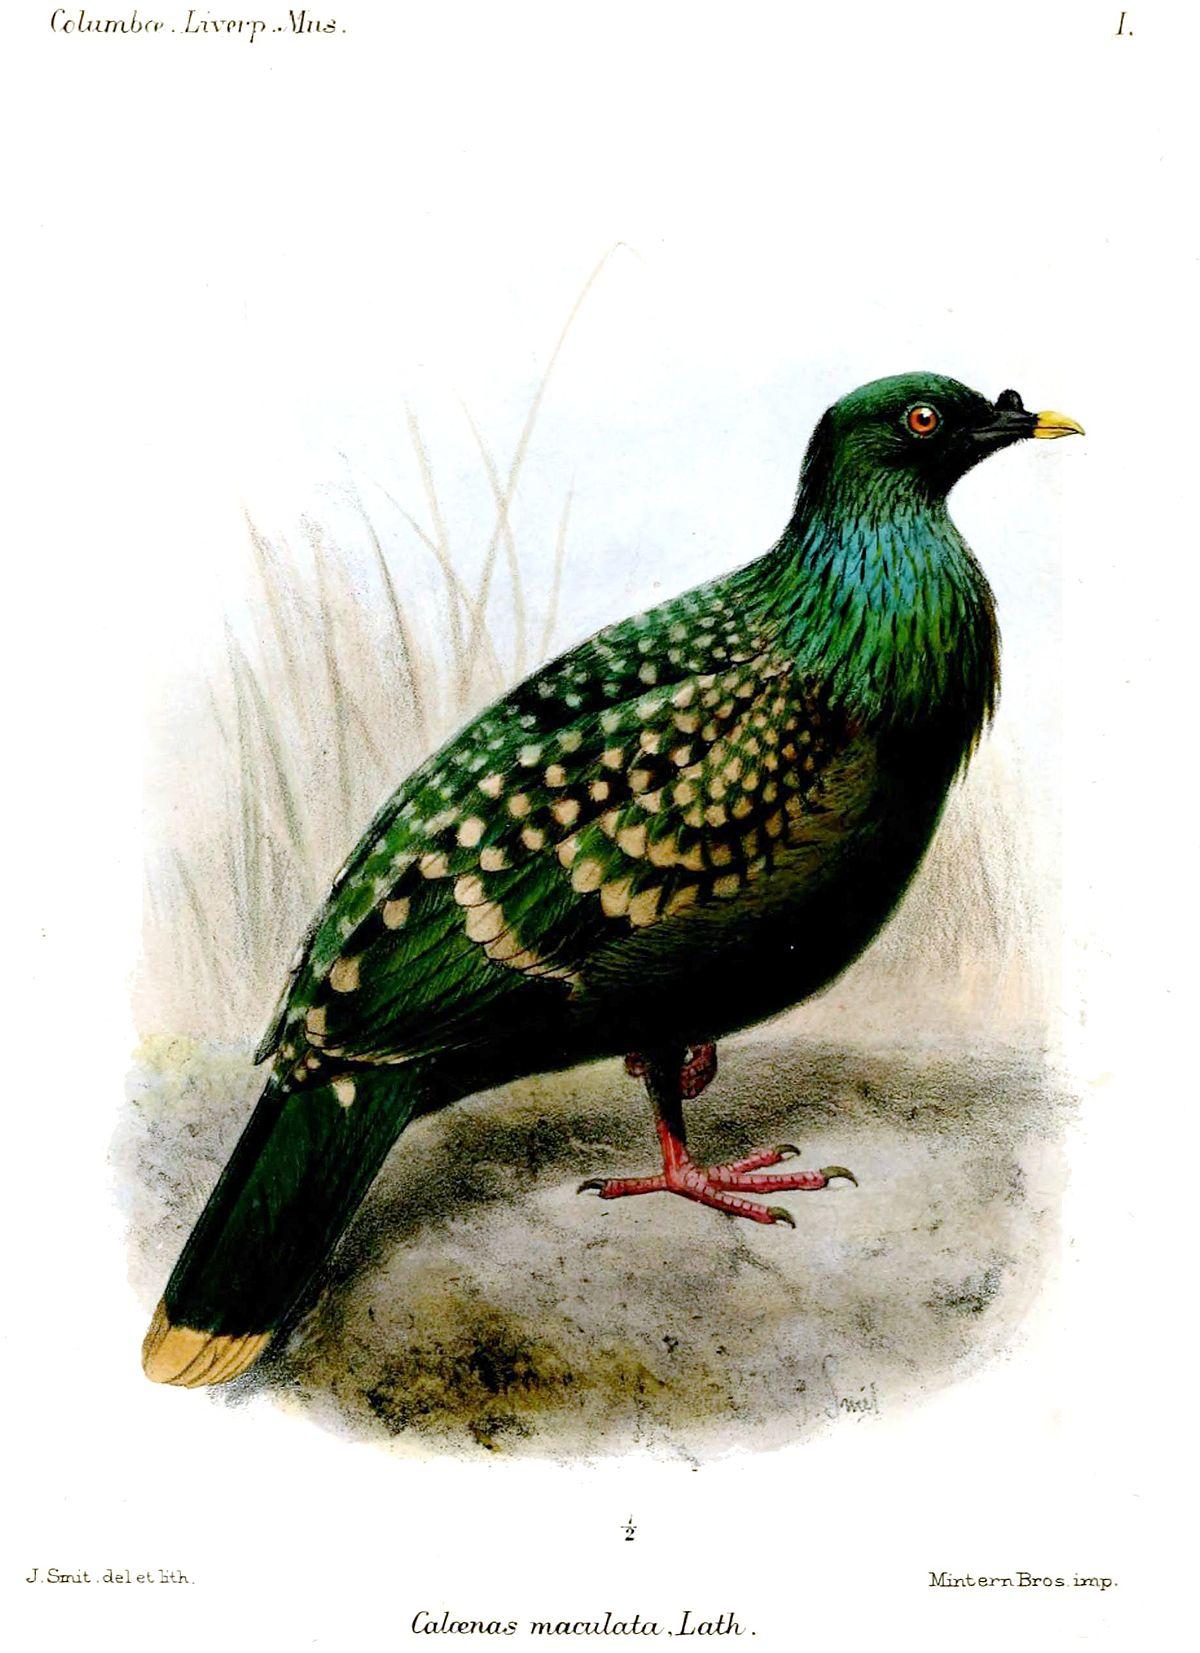 کبوتر سبز Spotted green pigeon - Wikidata